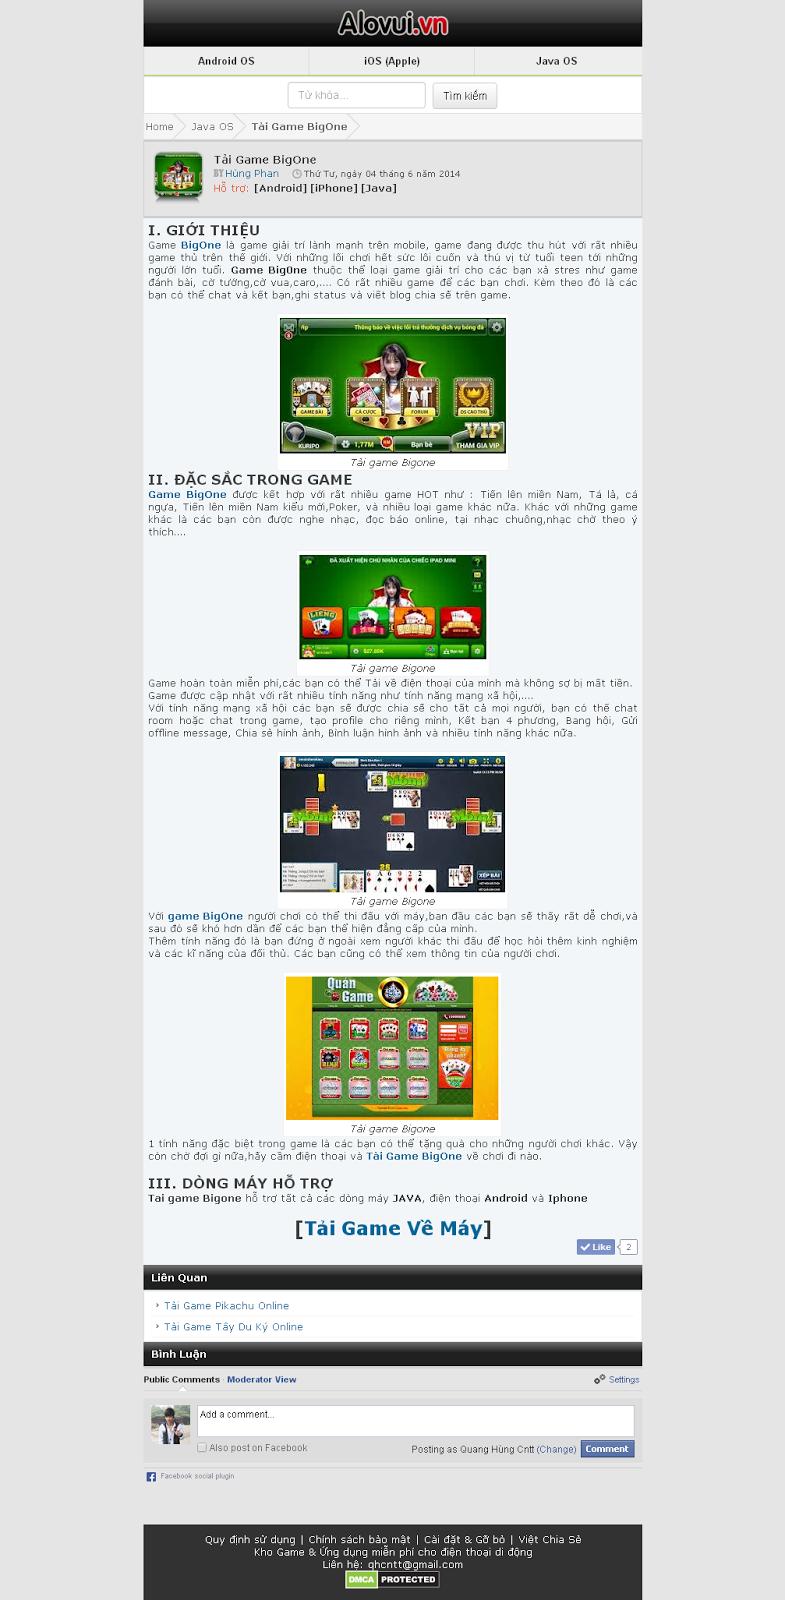 Template Blogspot Giống Alovui.vn Chuẩn w3c SEO Tốt